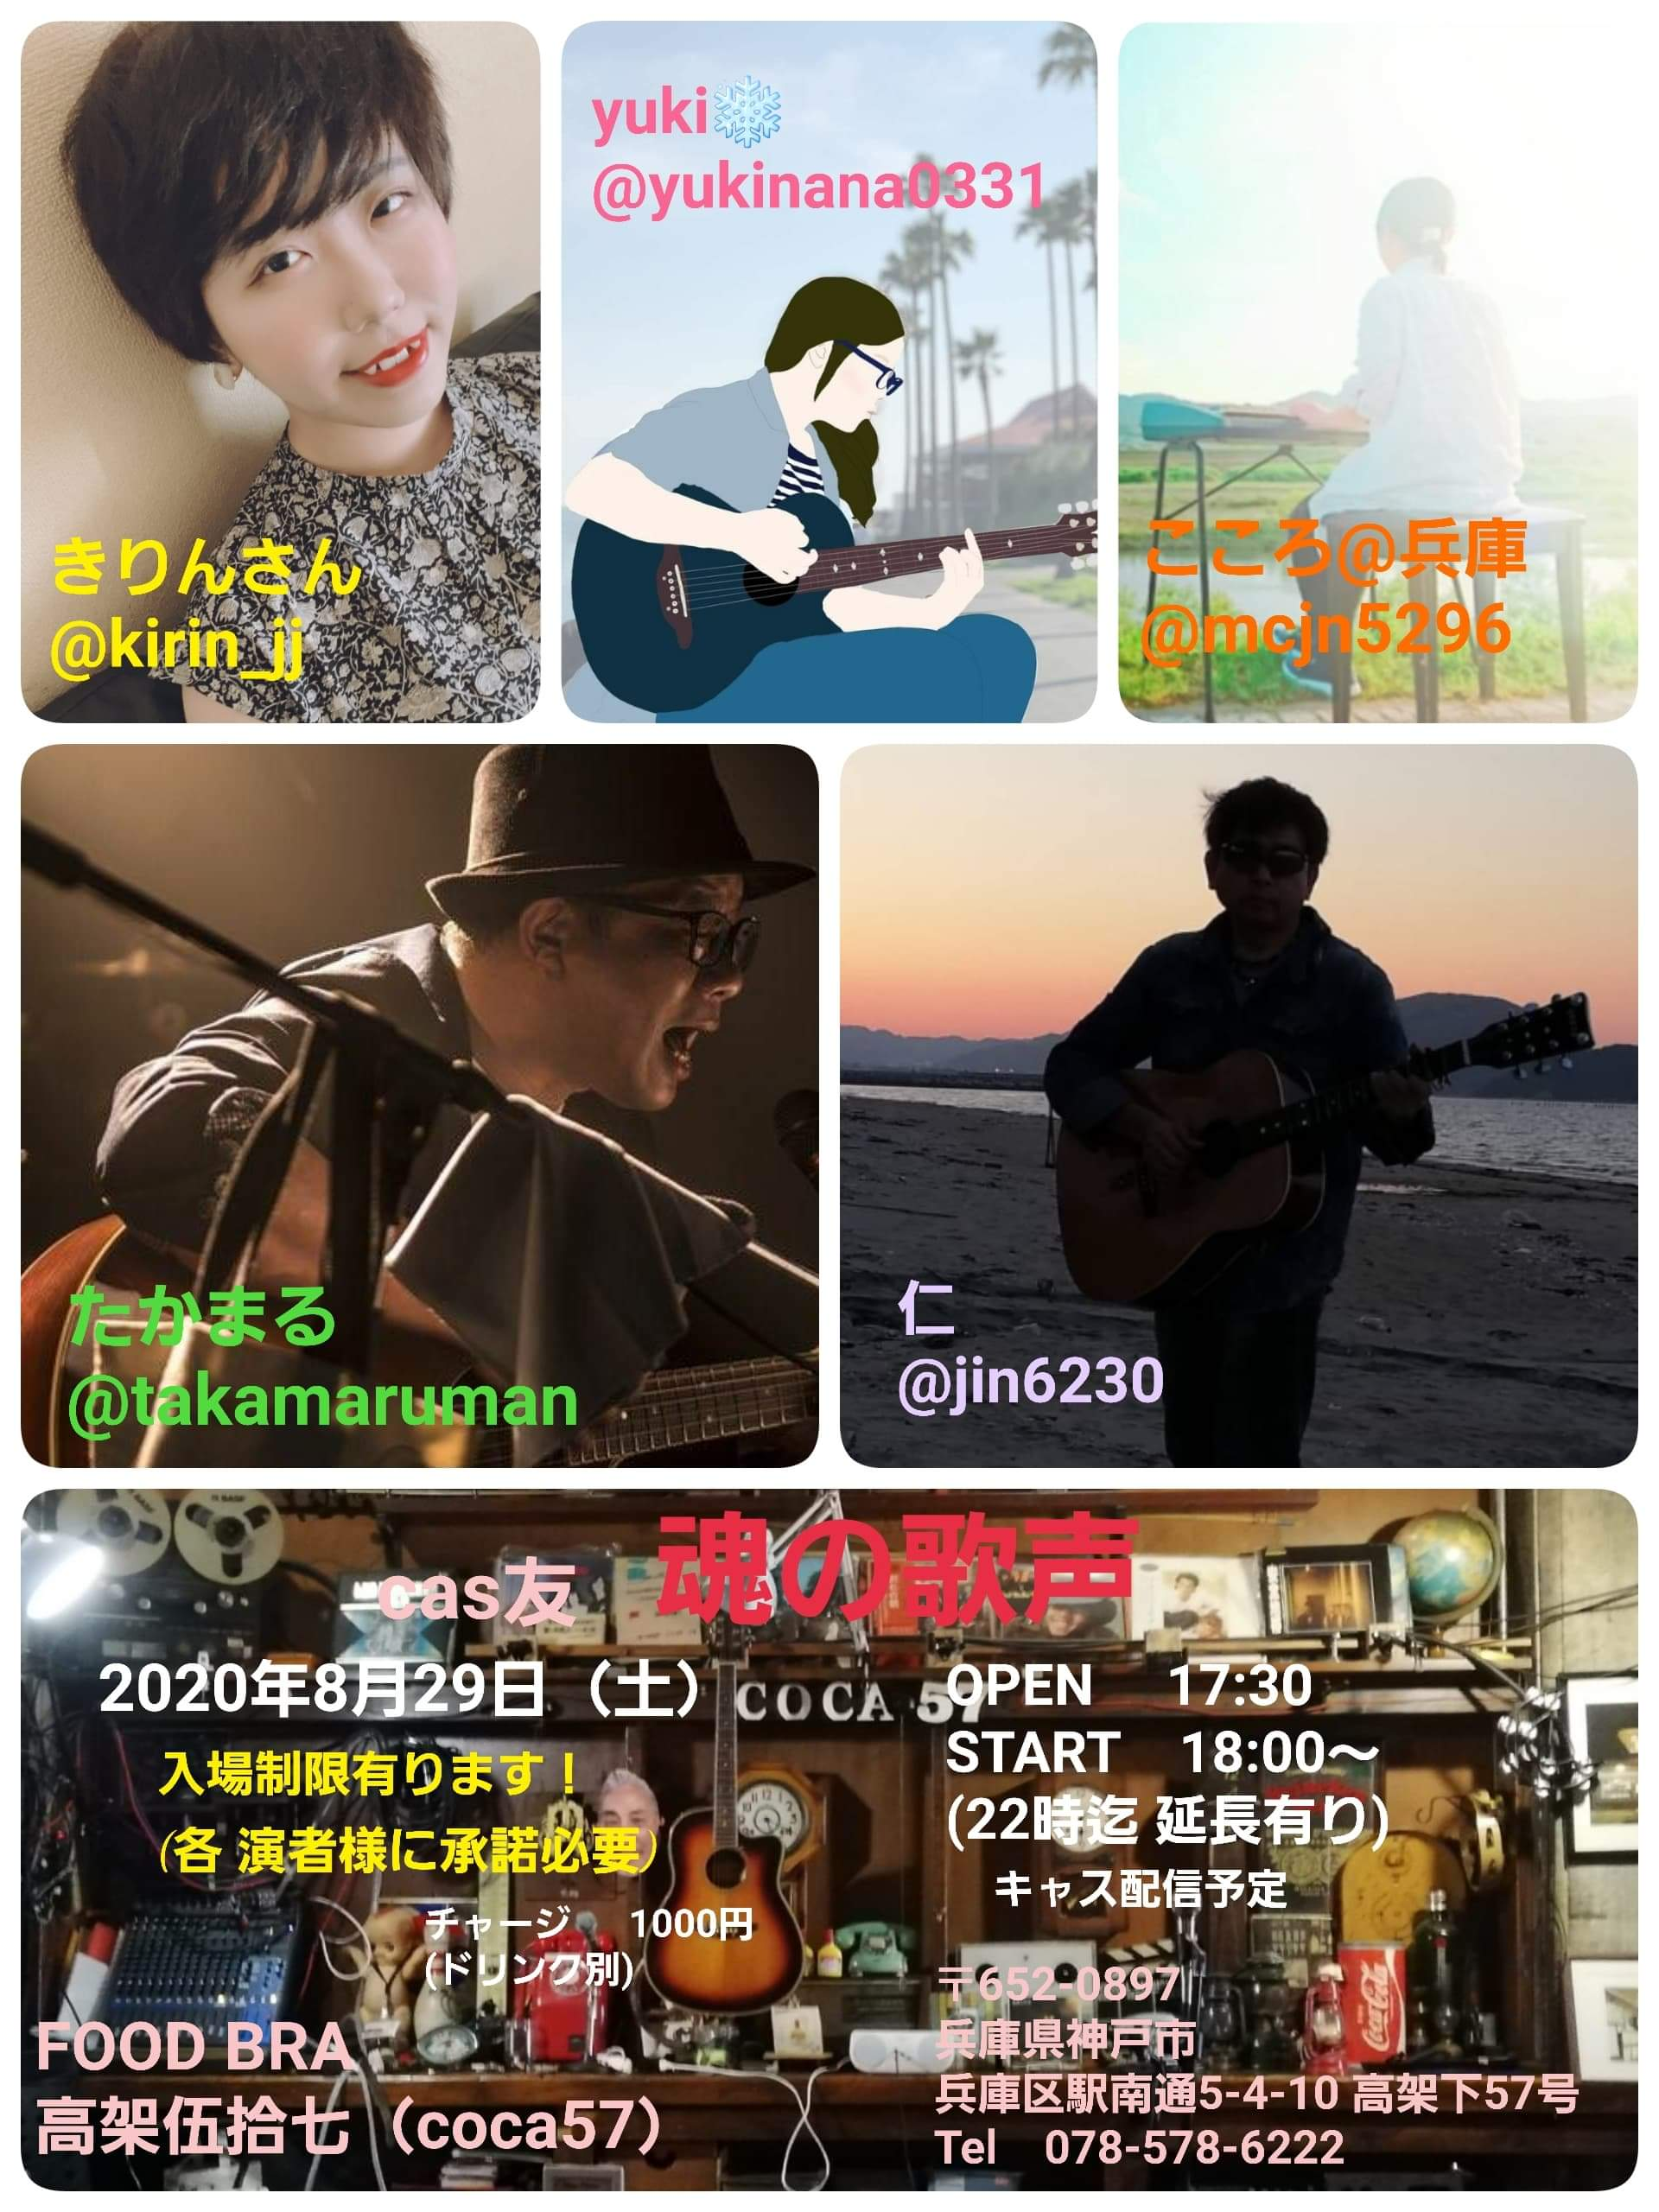 CAS友 魂の歌声 17時30分オープン